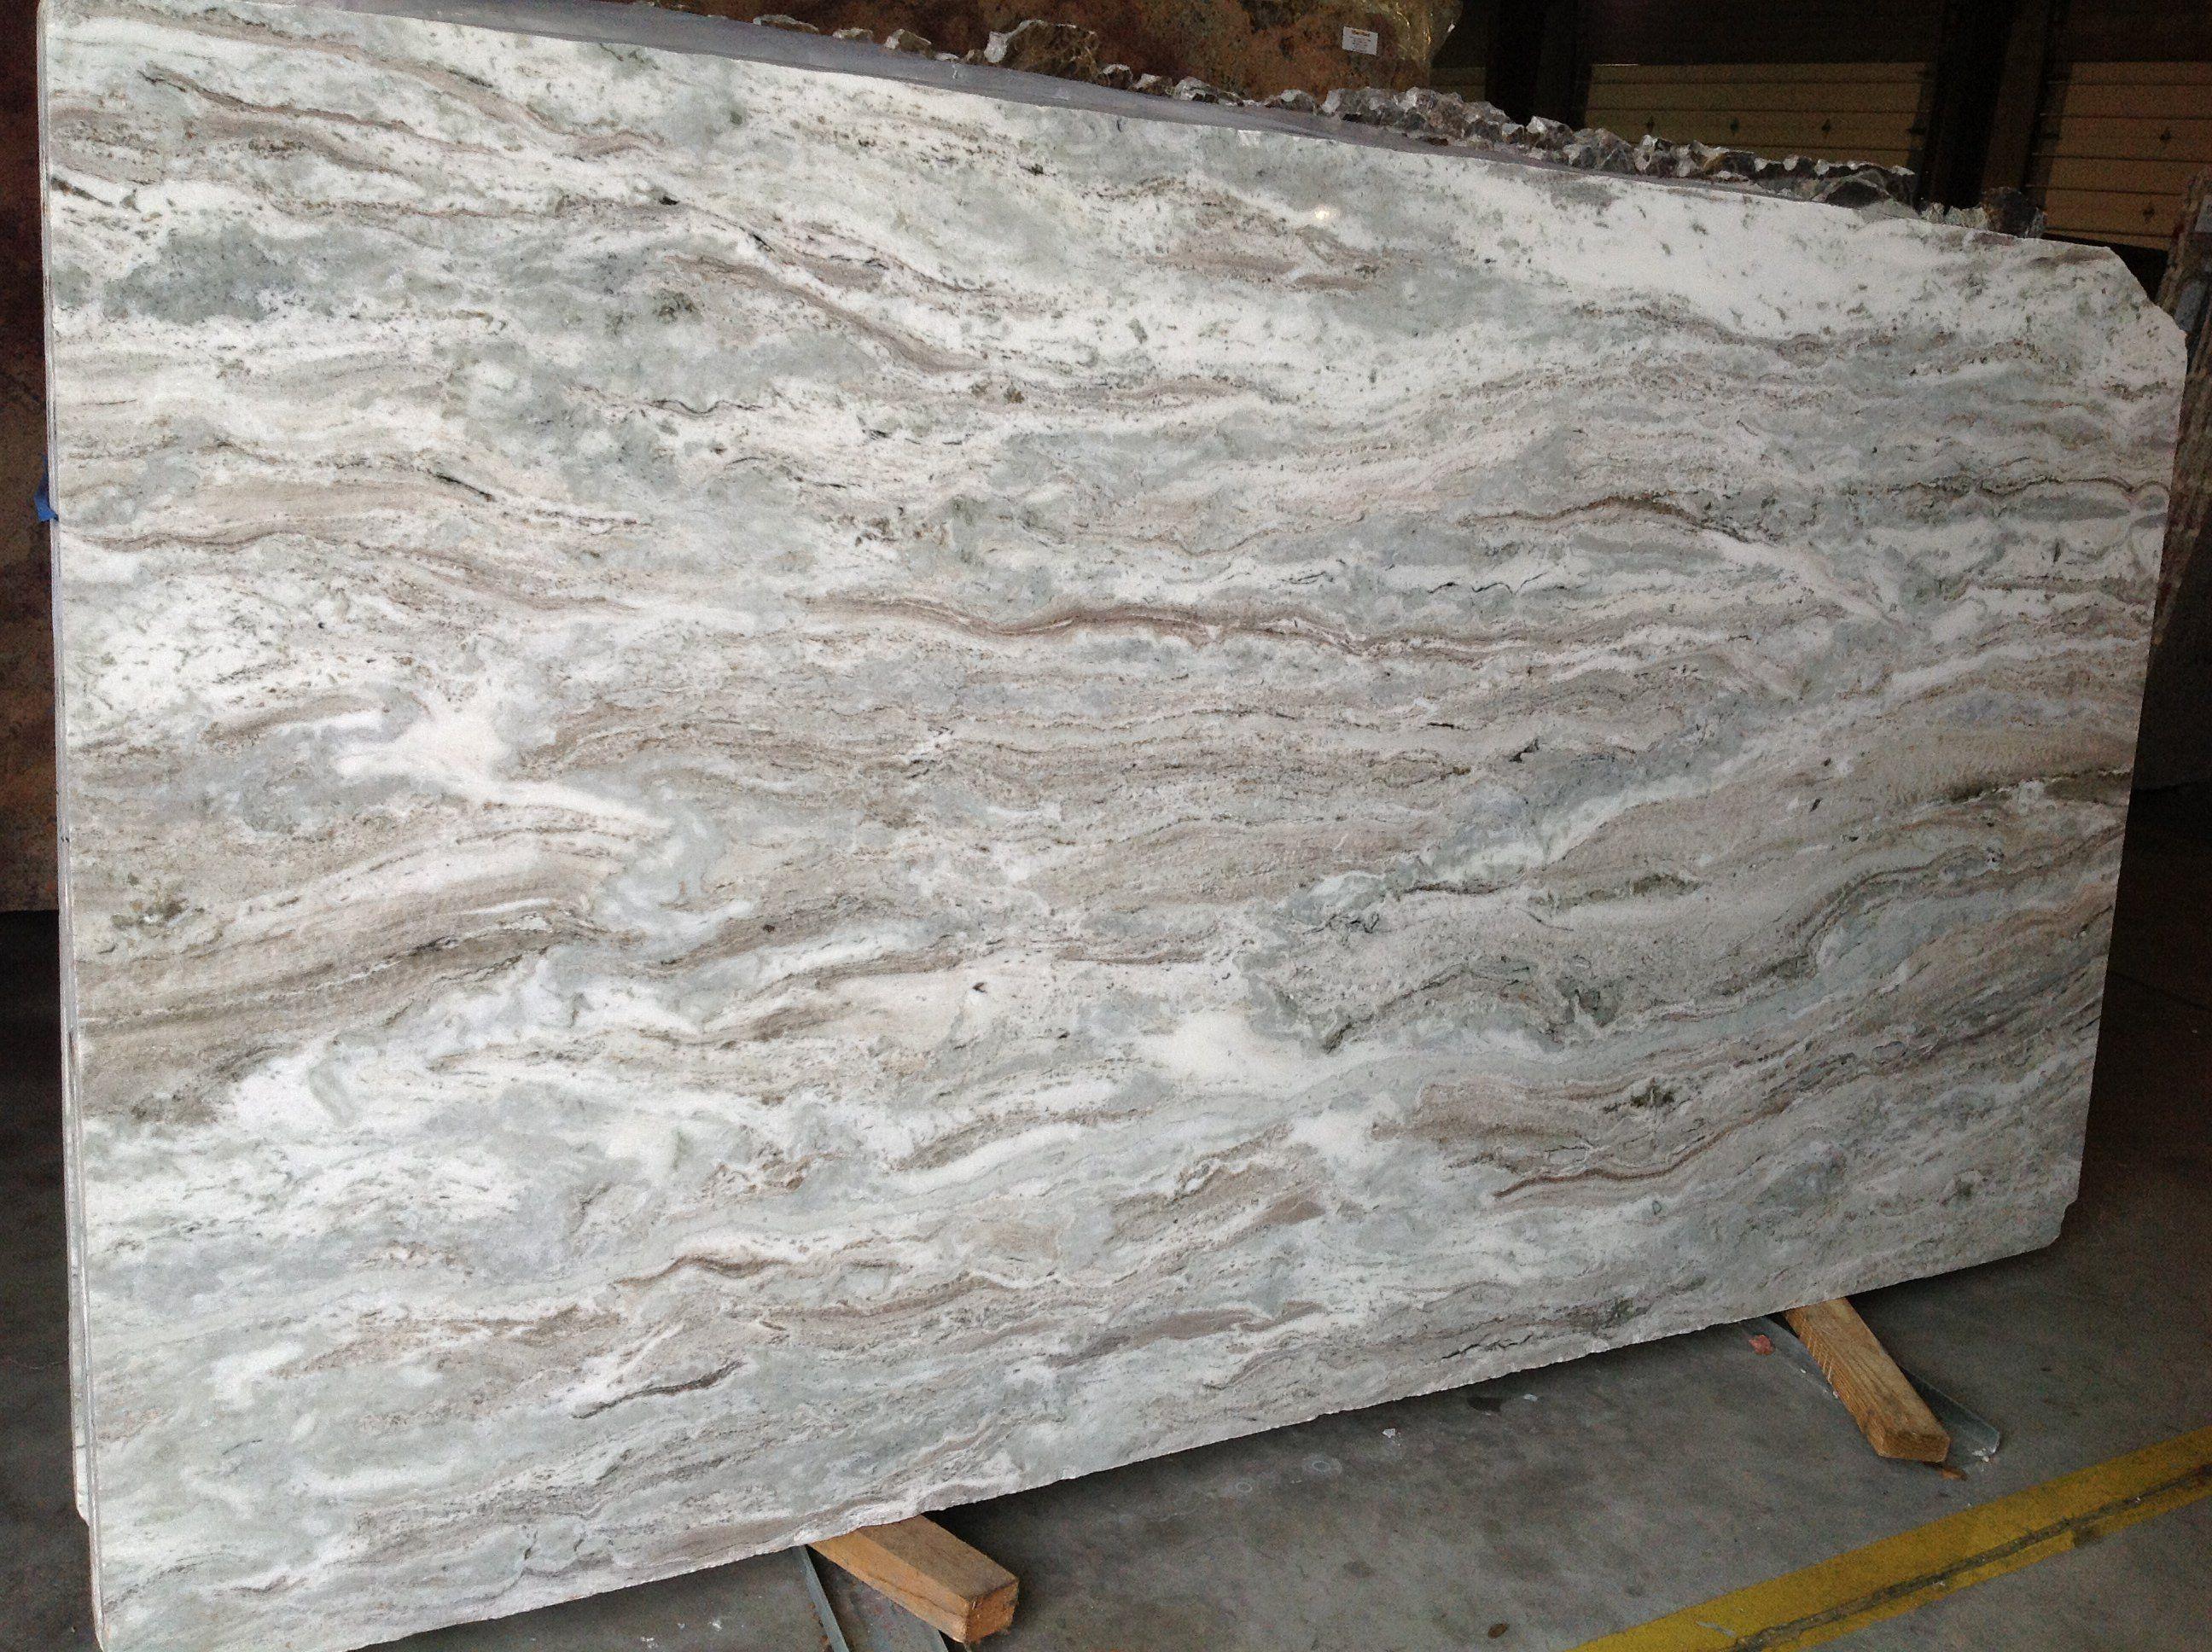 Select Stone L L C Mascavo 3cm Quartzite Luxury Vinyl Tile Subway Tile Backsplash Kitchen